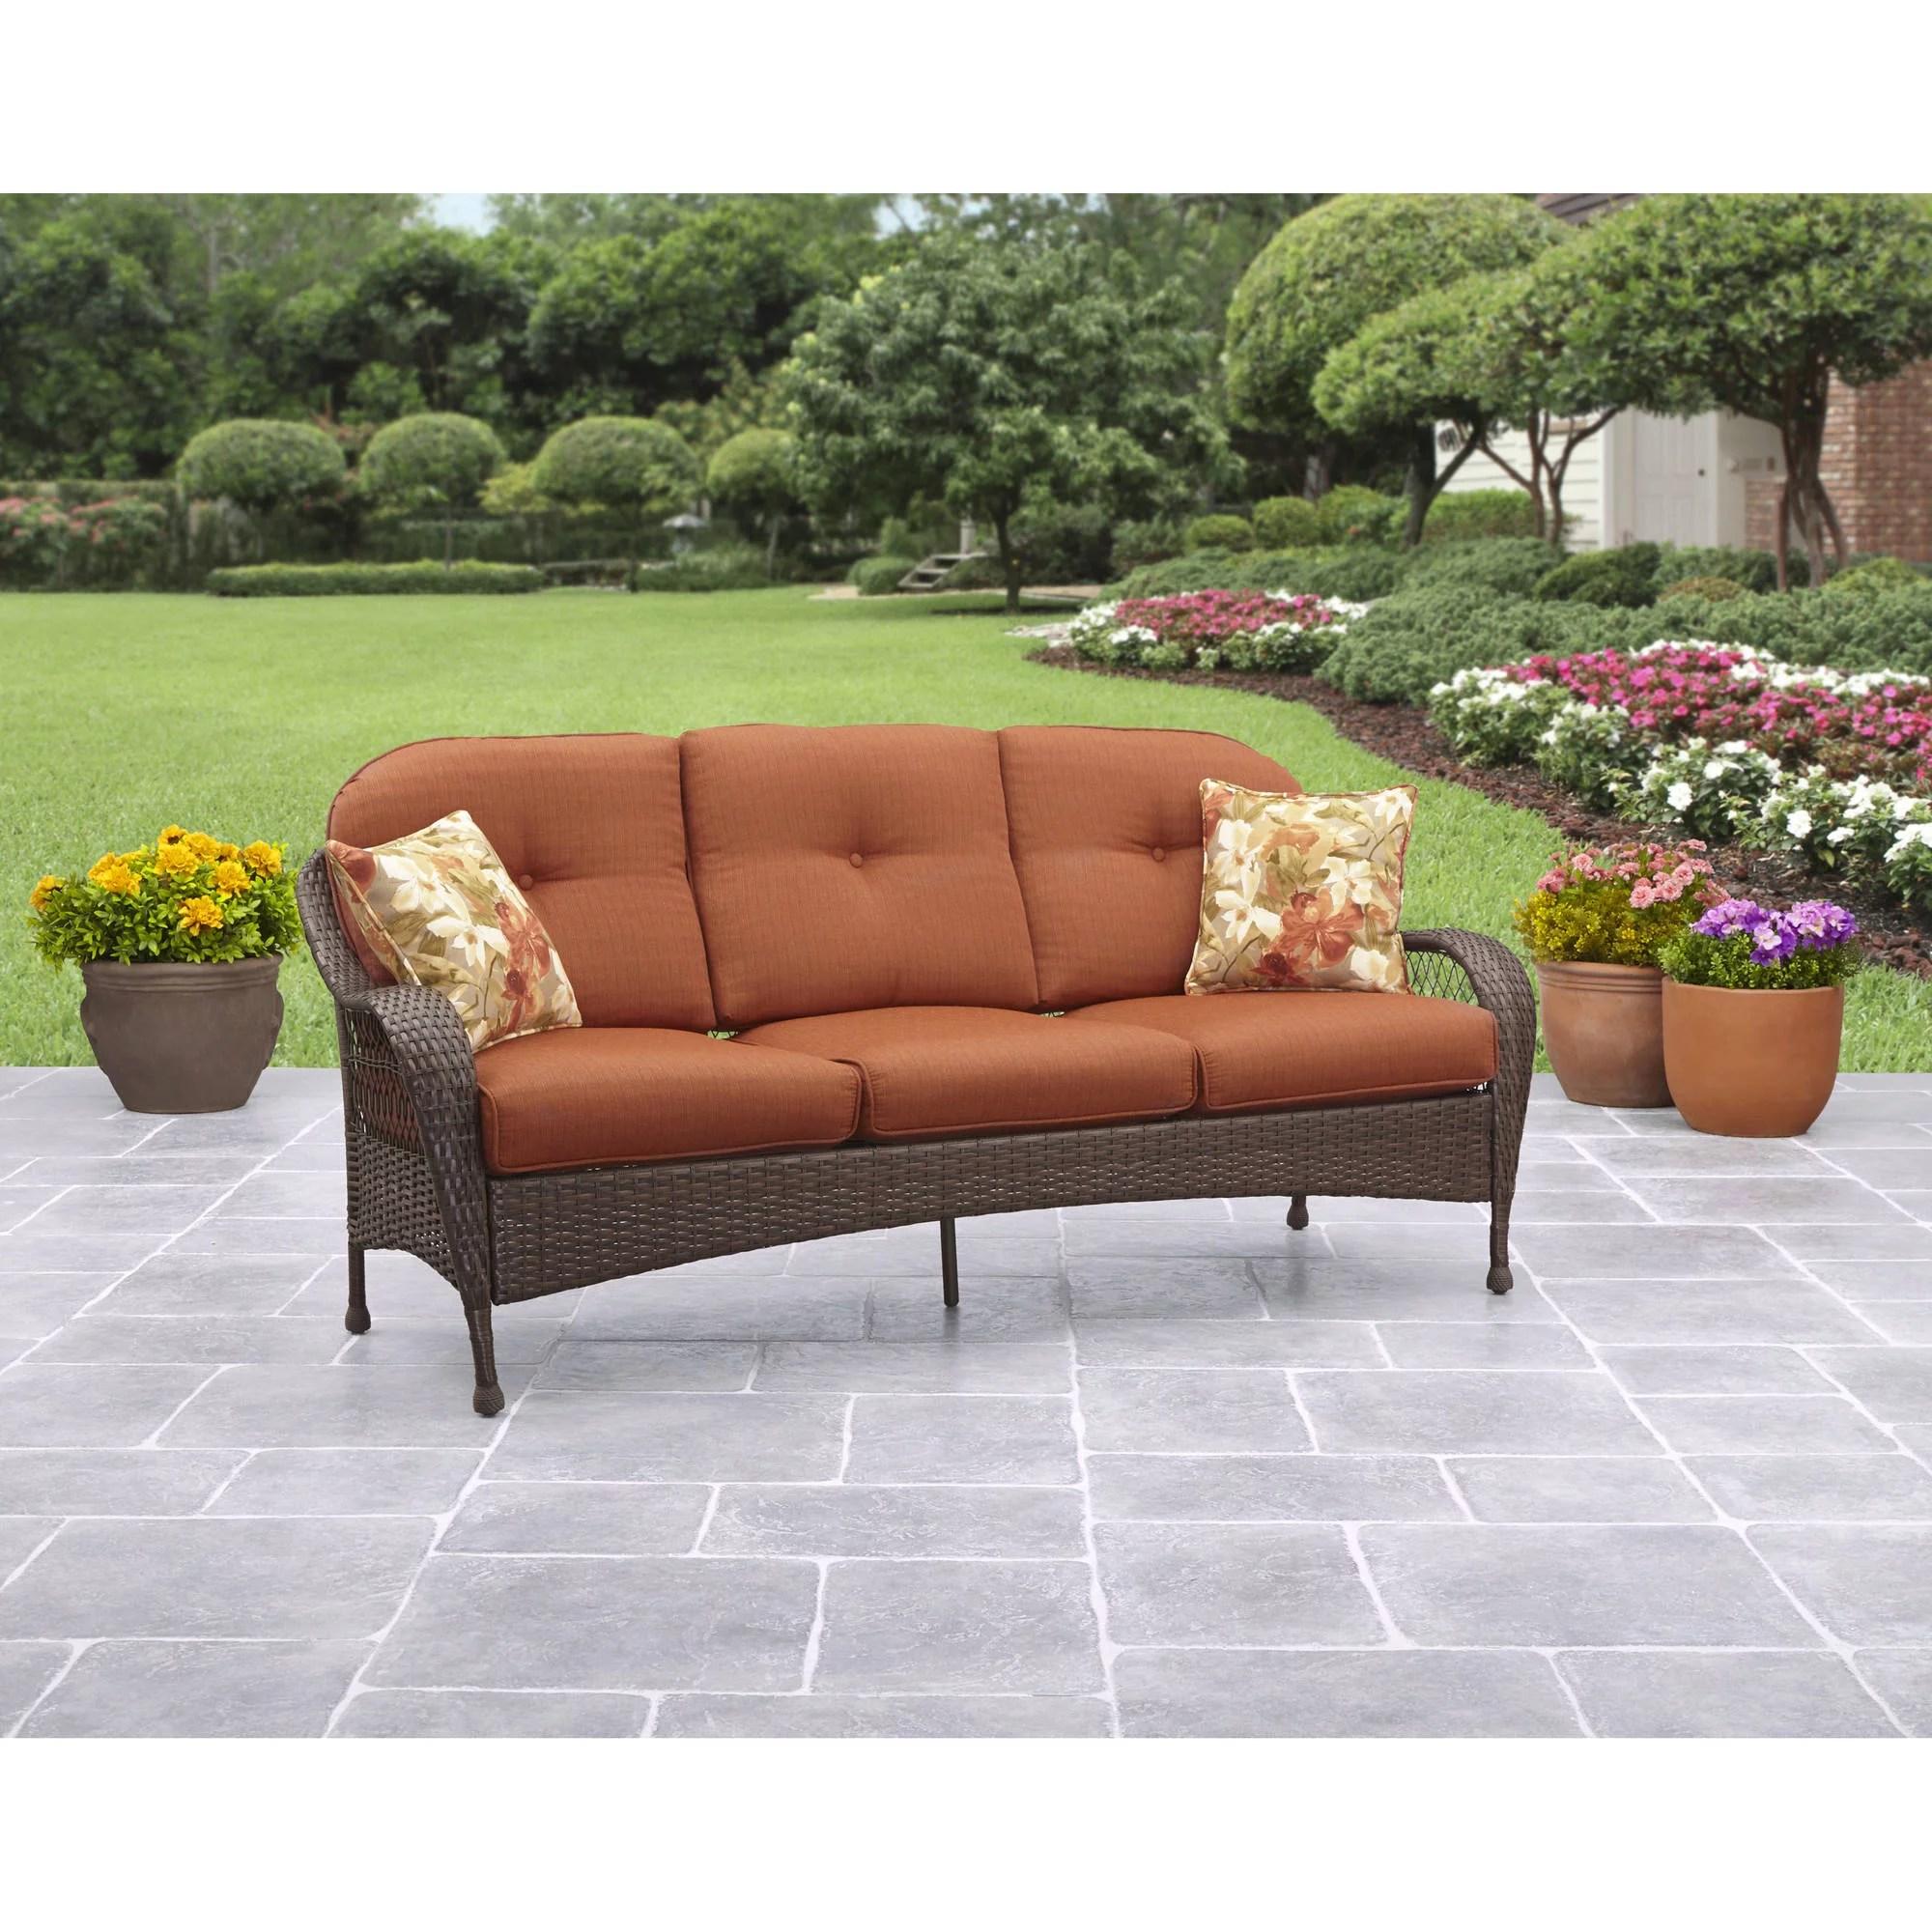 azalea patio furniture walmart com